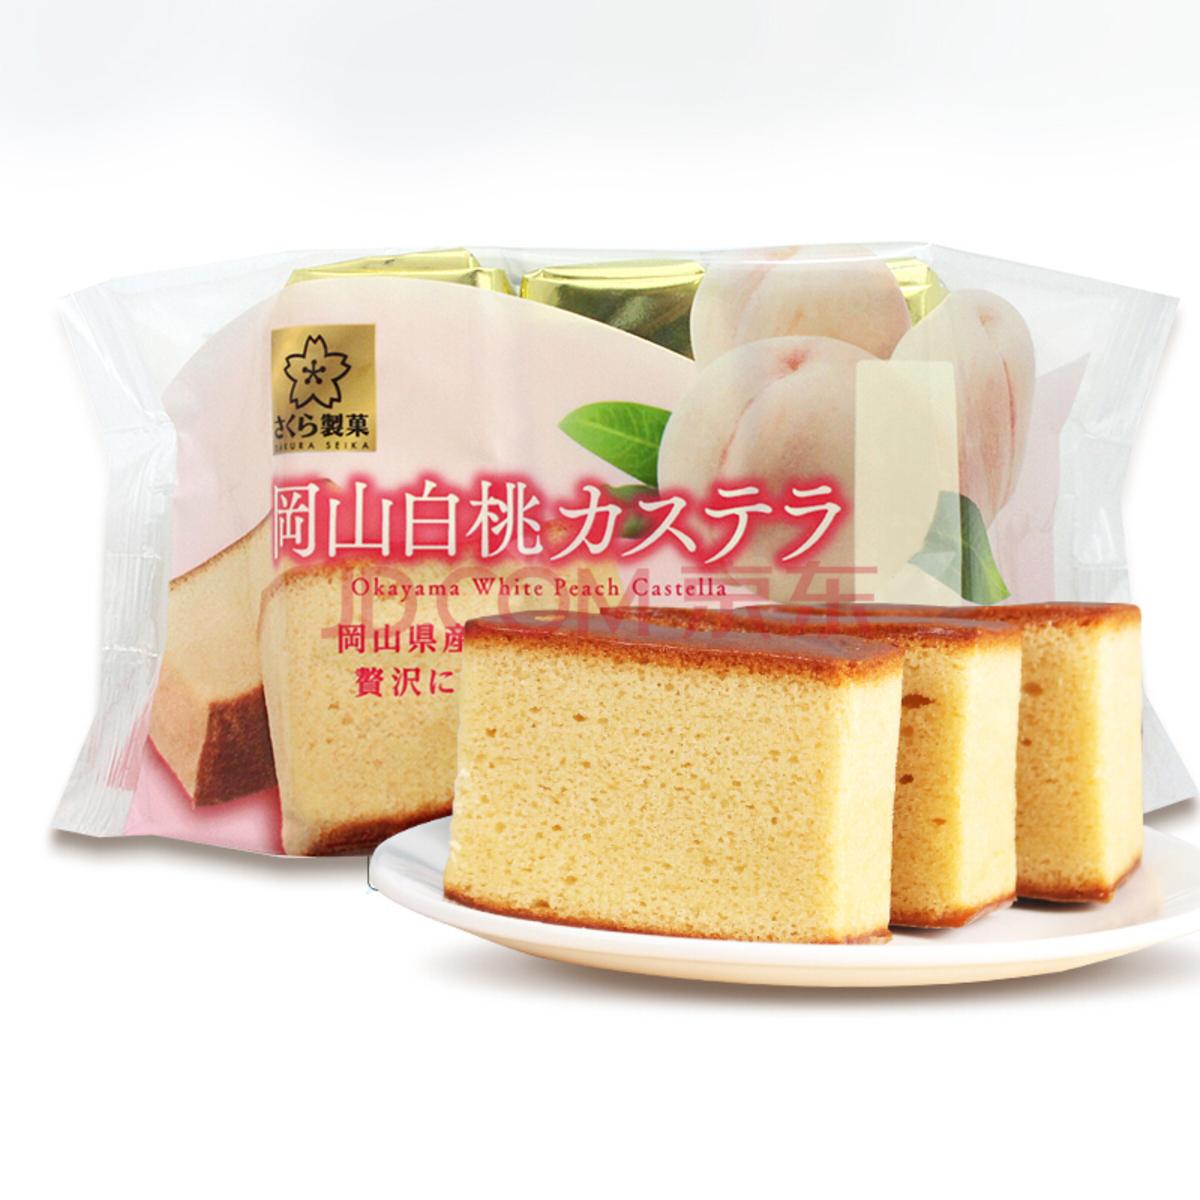 Sakura Seika Okayama White Peach Castella 120g